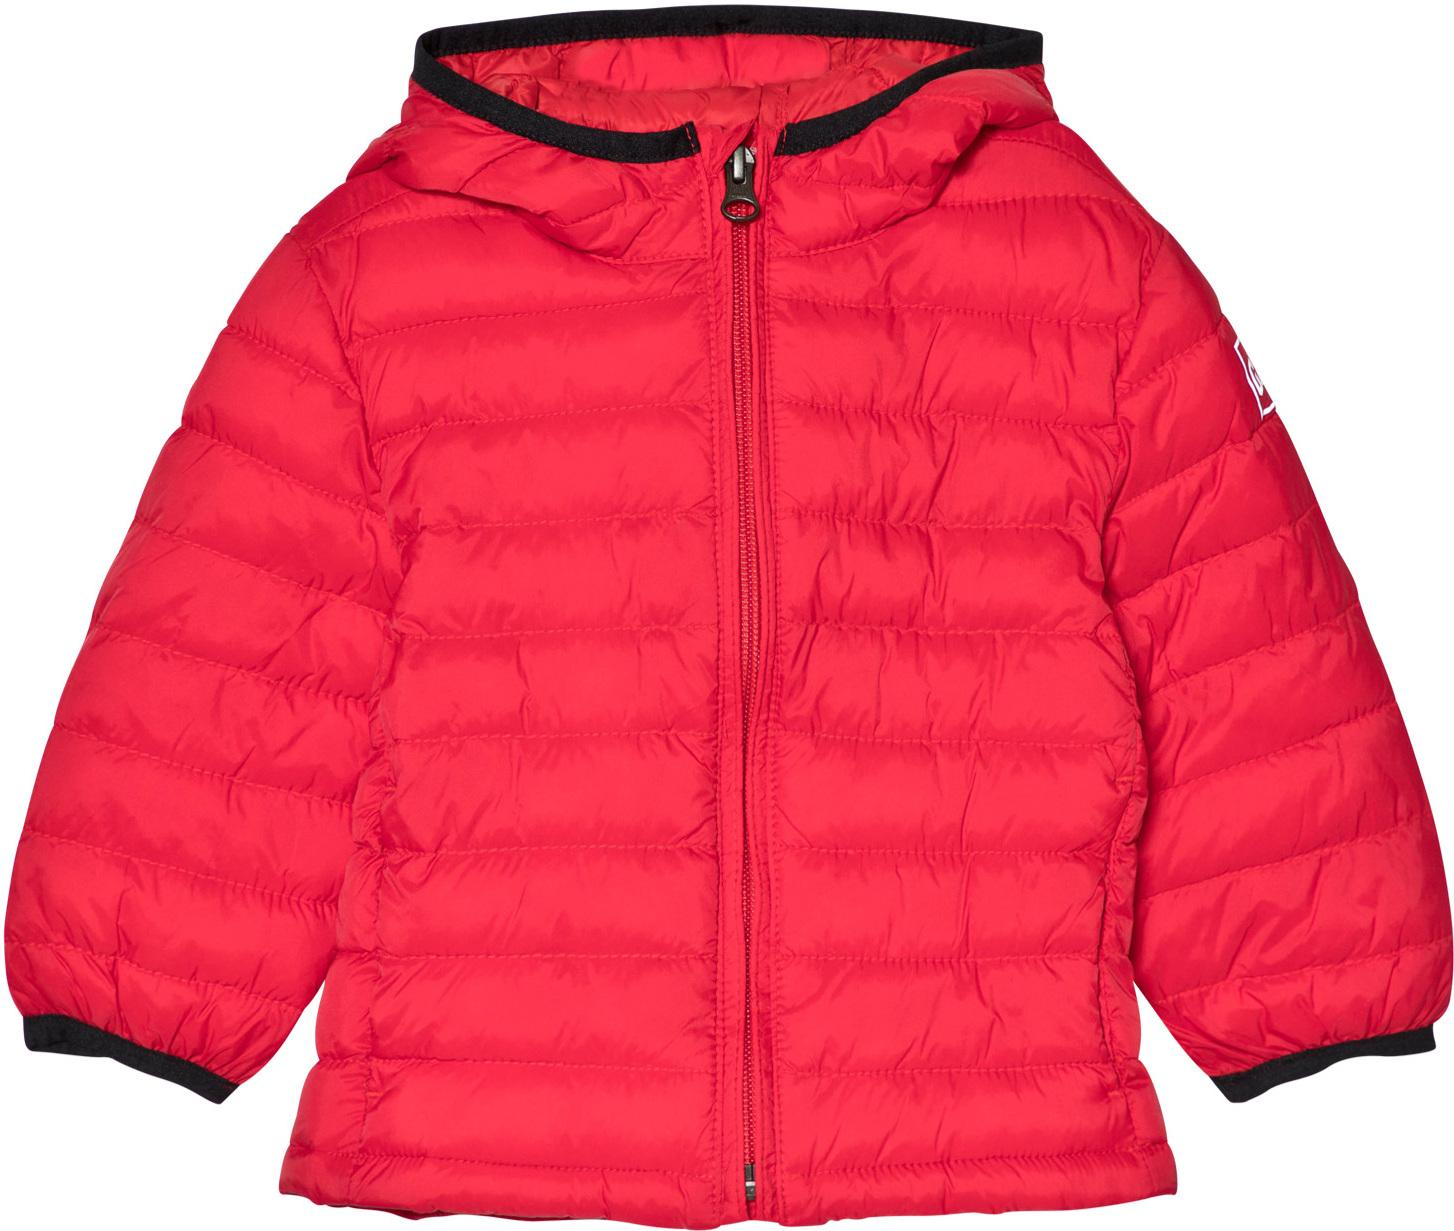 4c502c21 Best pris på GAP Toddler Padded Jacket - Se priser før kjøp i Prisguiden